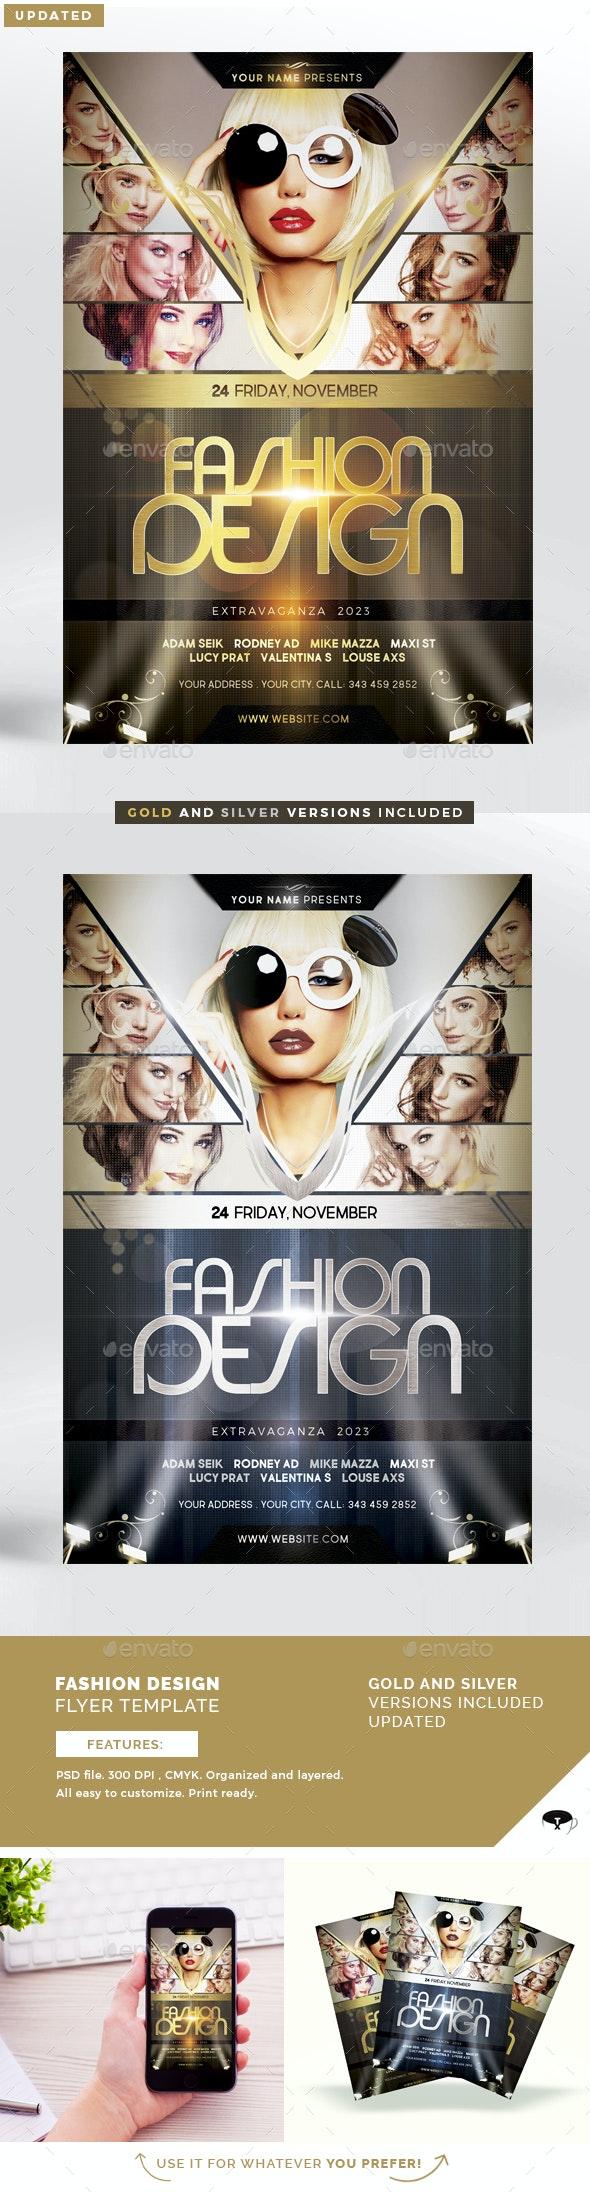 Fashion Design Flyer Template - Flyers Print Templates